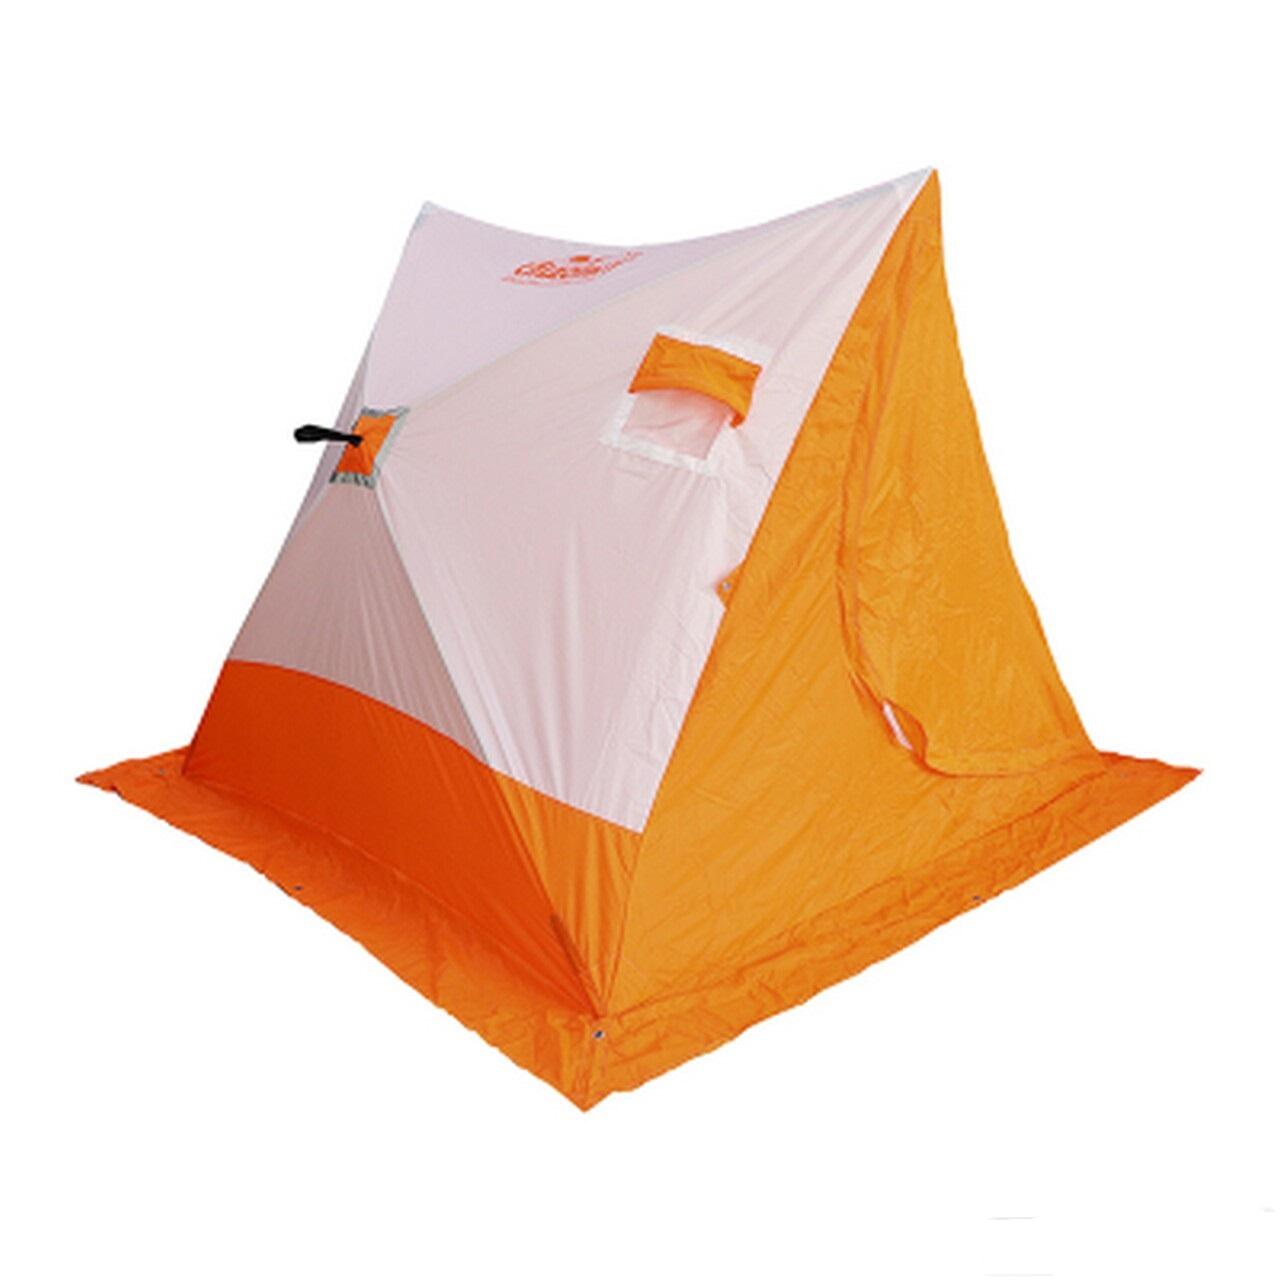 Палатка зимняя 2-скатная СЛЕДОПЫТ, цв. бело-оранж.